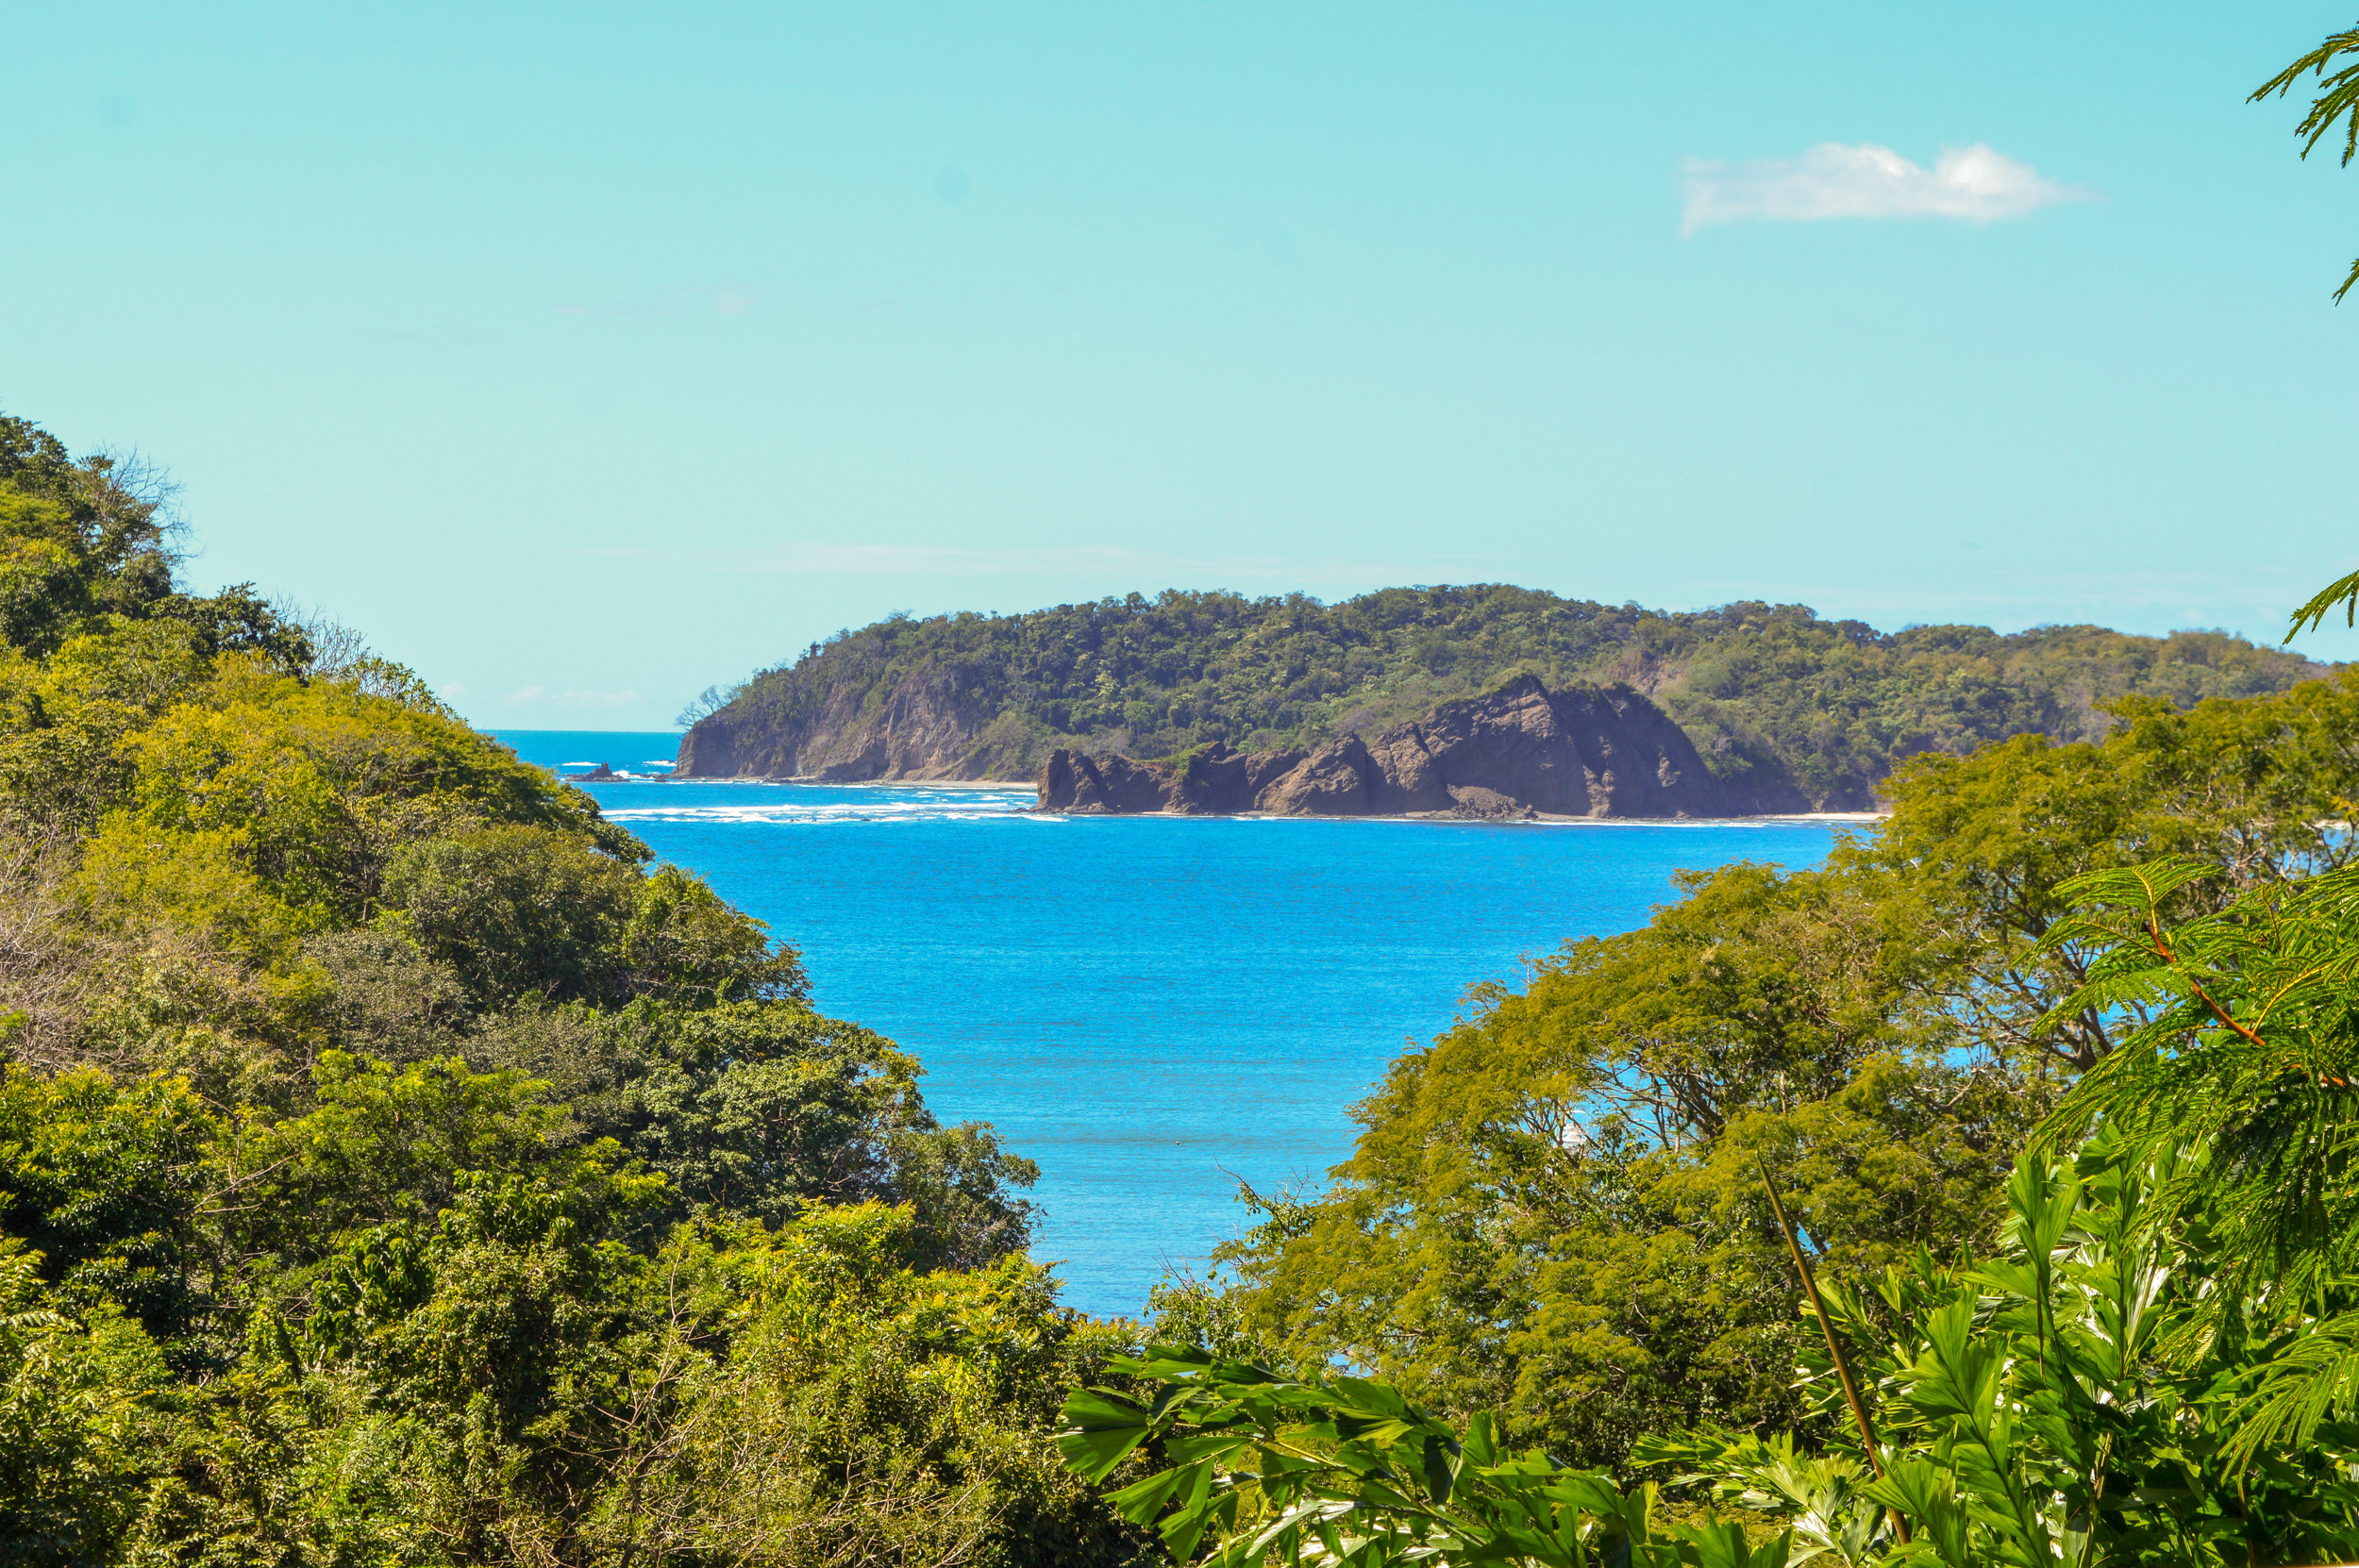 Carrillo Bay